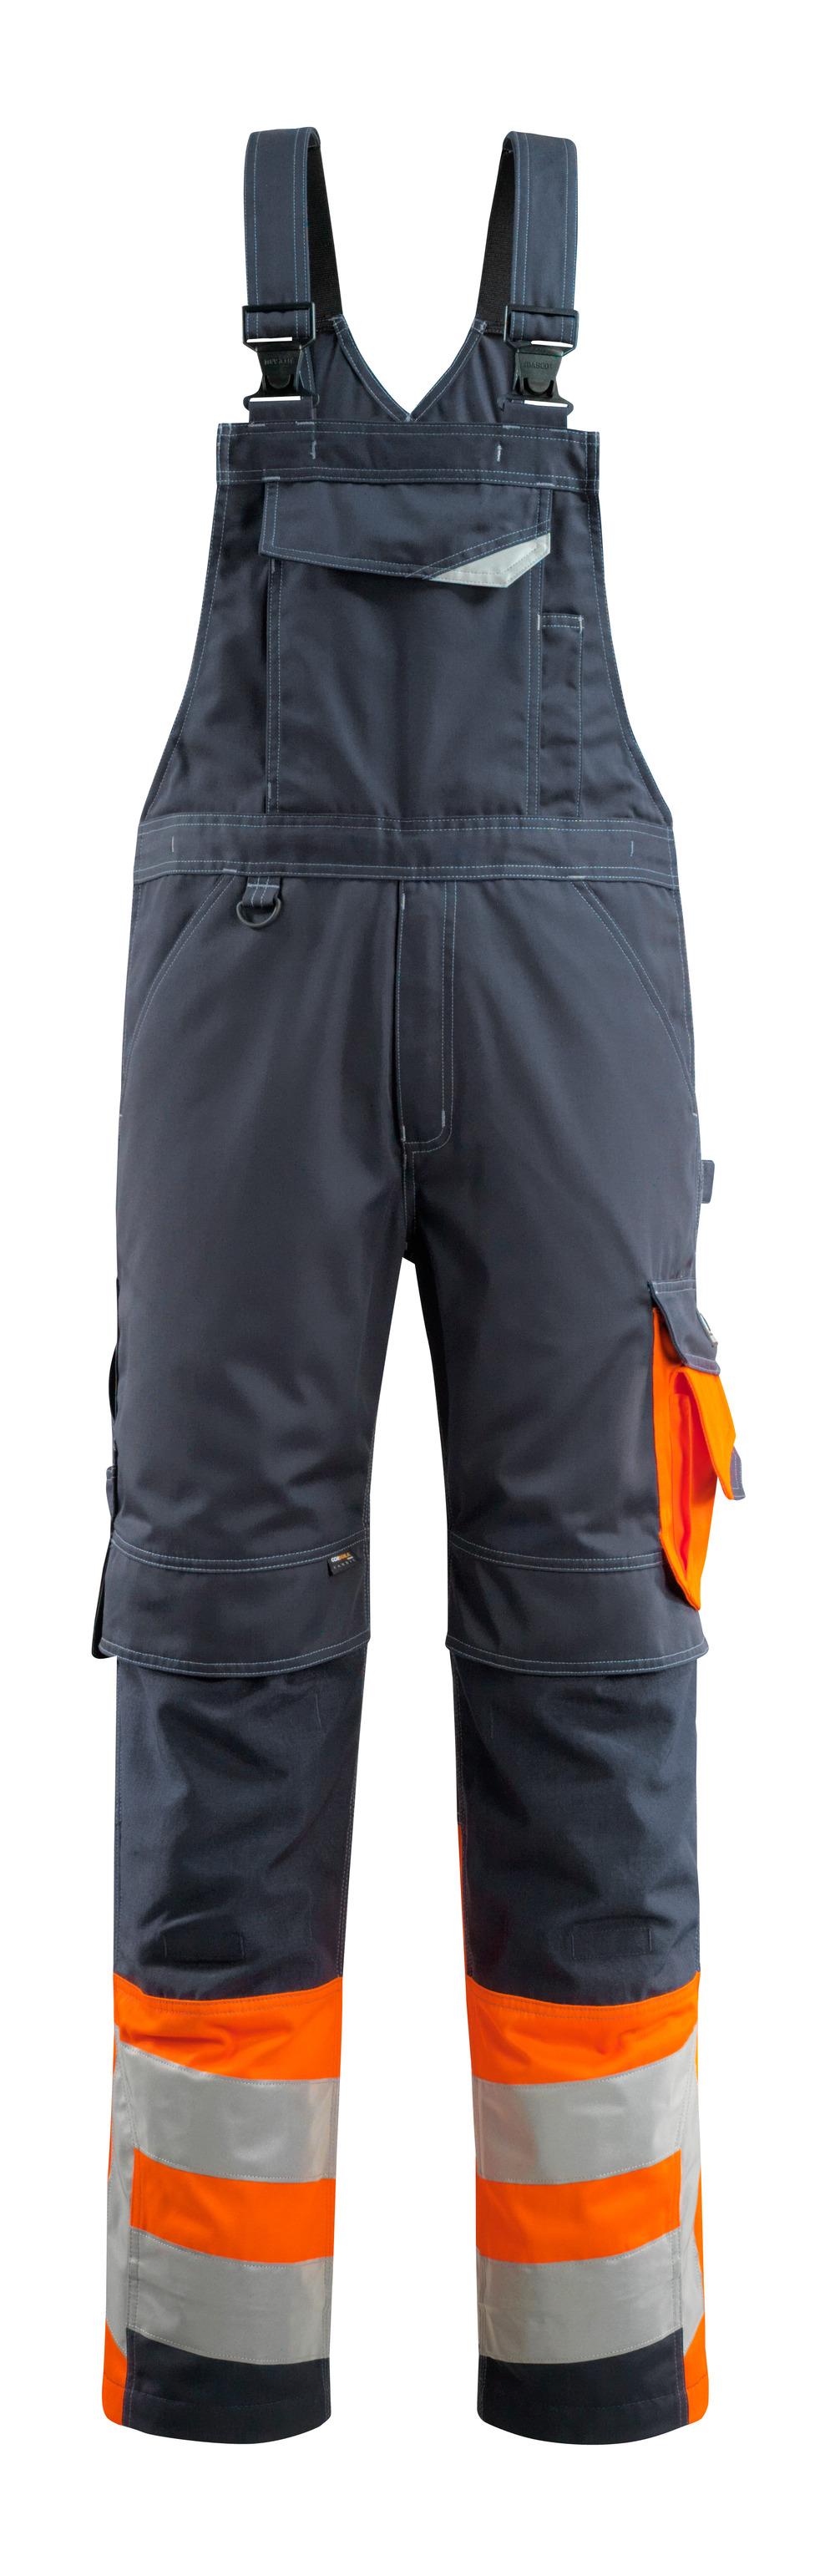 15669-860-01014 Bib & Brace with kneepad pockets - dark navy/hi-vis orange